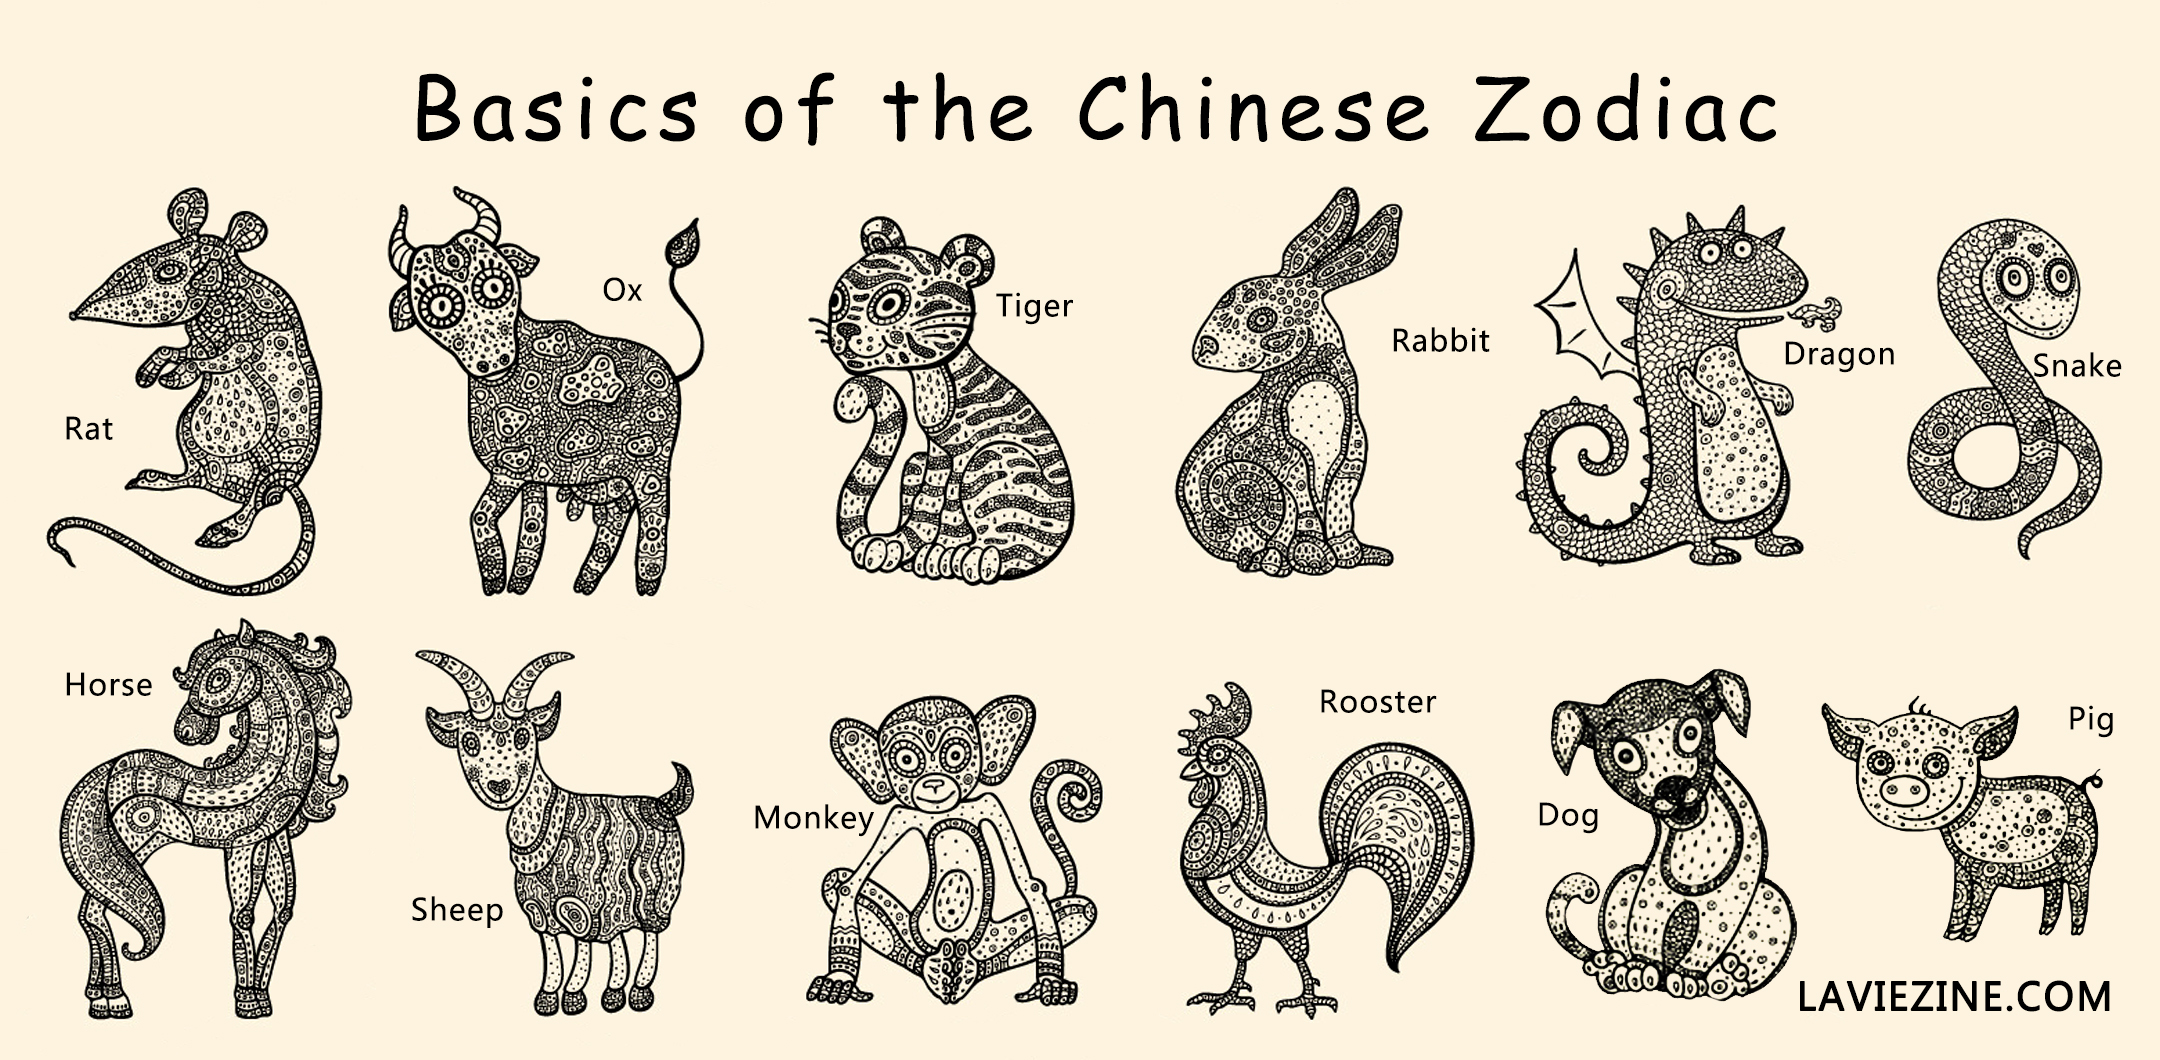 Basics Of The Chinese Zodiac